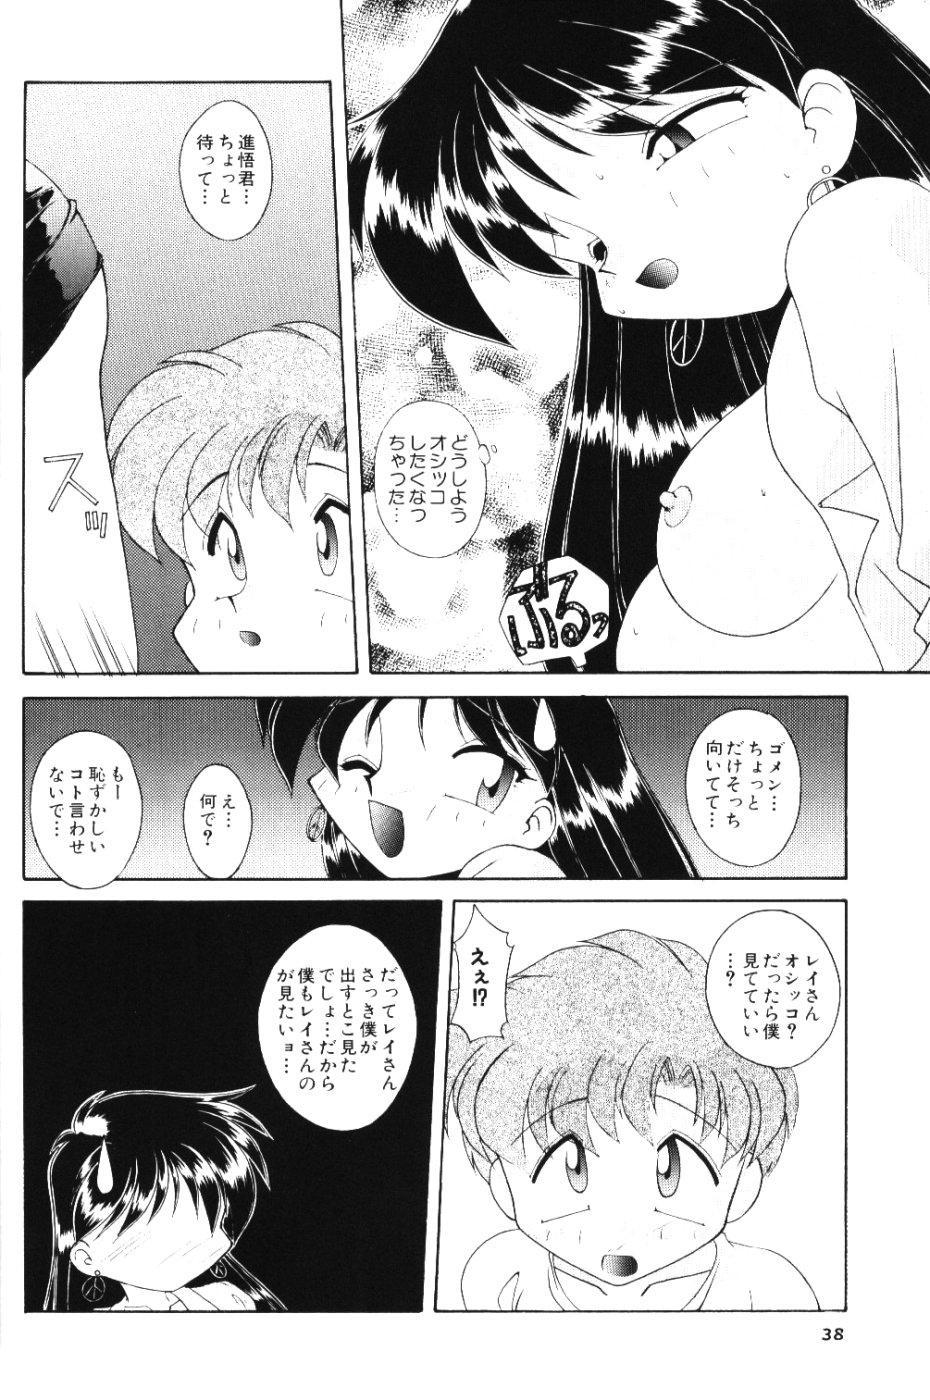 Moon Memories Vol. 2 36